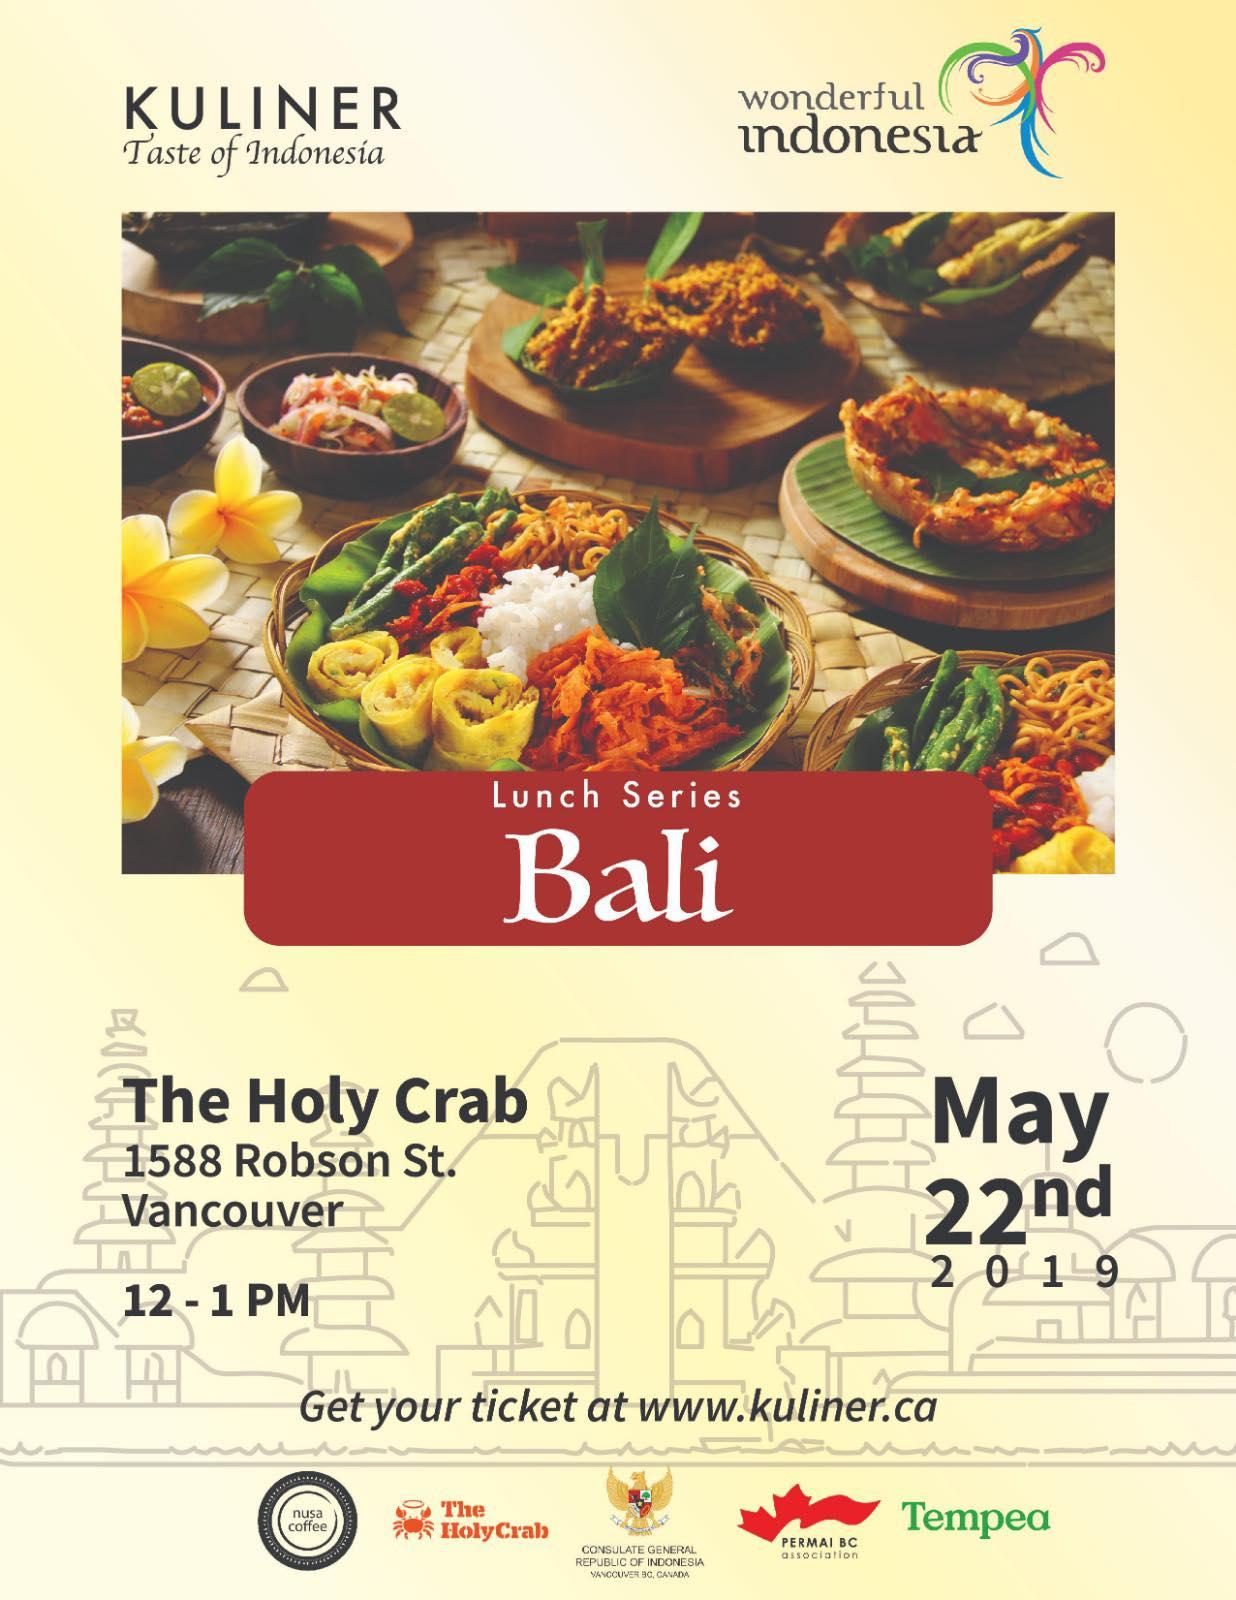 Kuliner Taste Of Indonesia Vancouver Asian Heritage